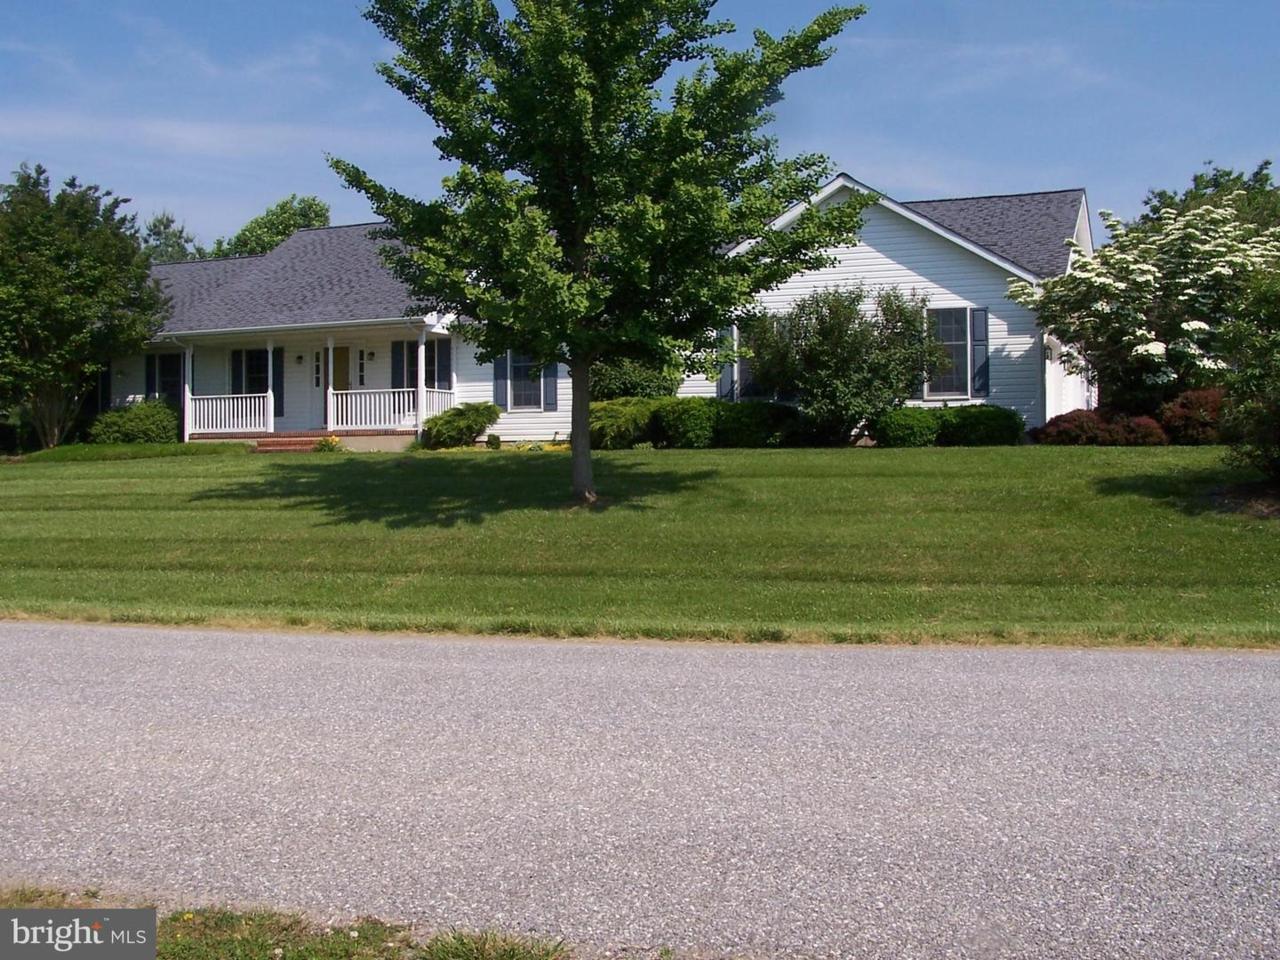 816 Meadowview Drive - Photo 1